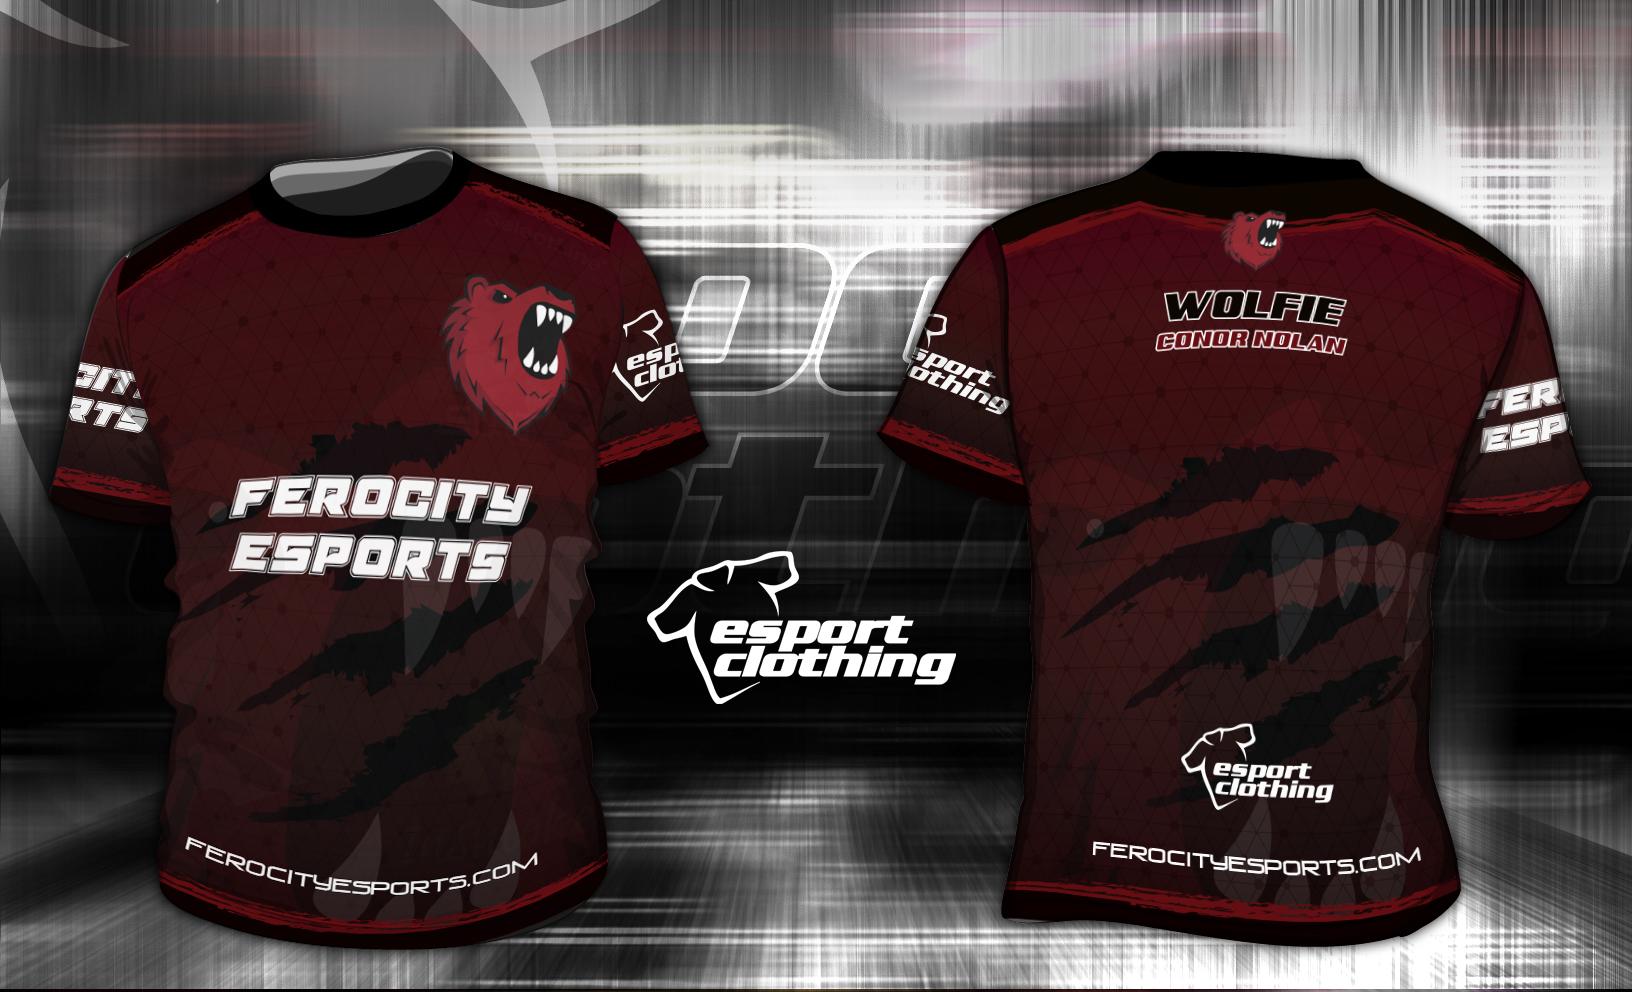 Ferocity - Athlete Short Sleeve Jersey